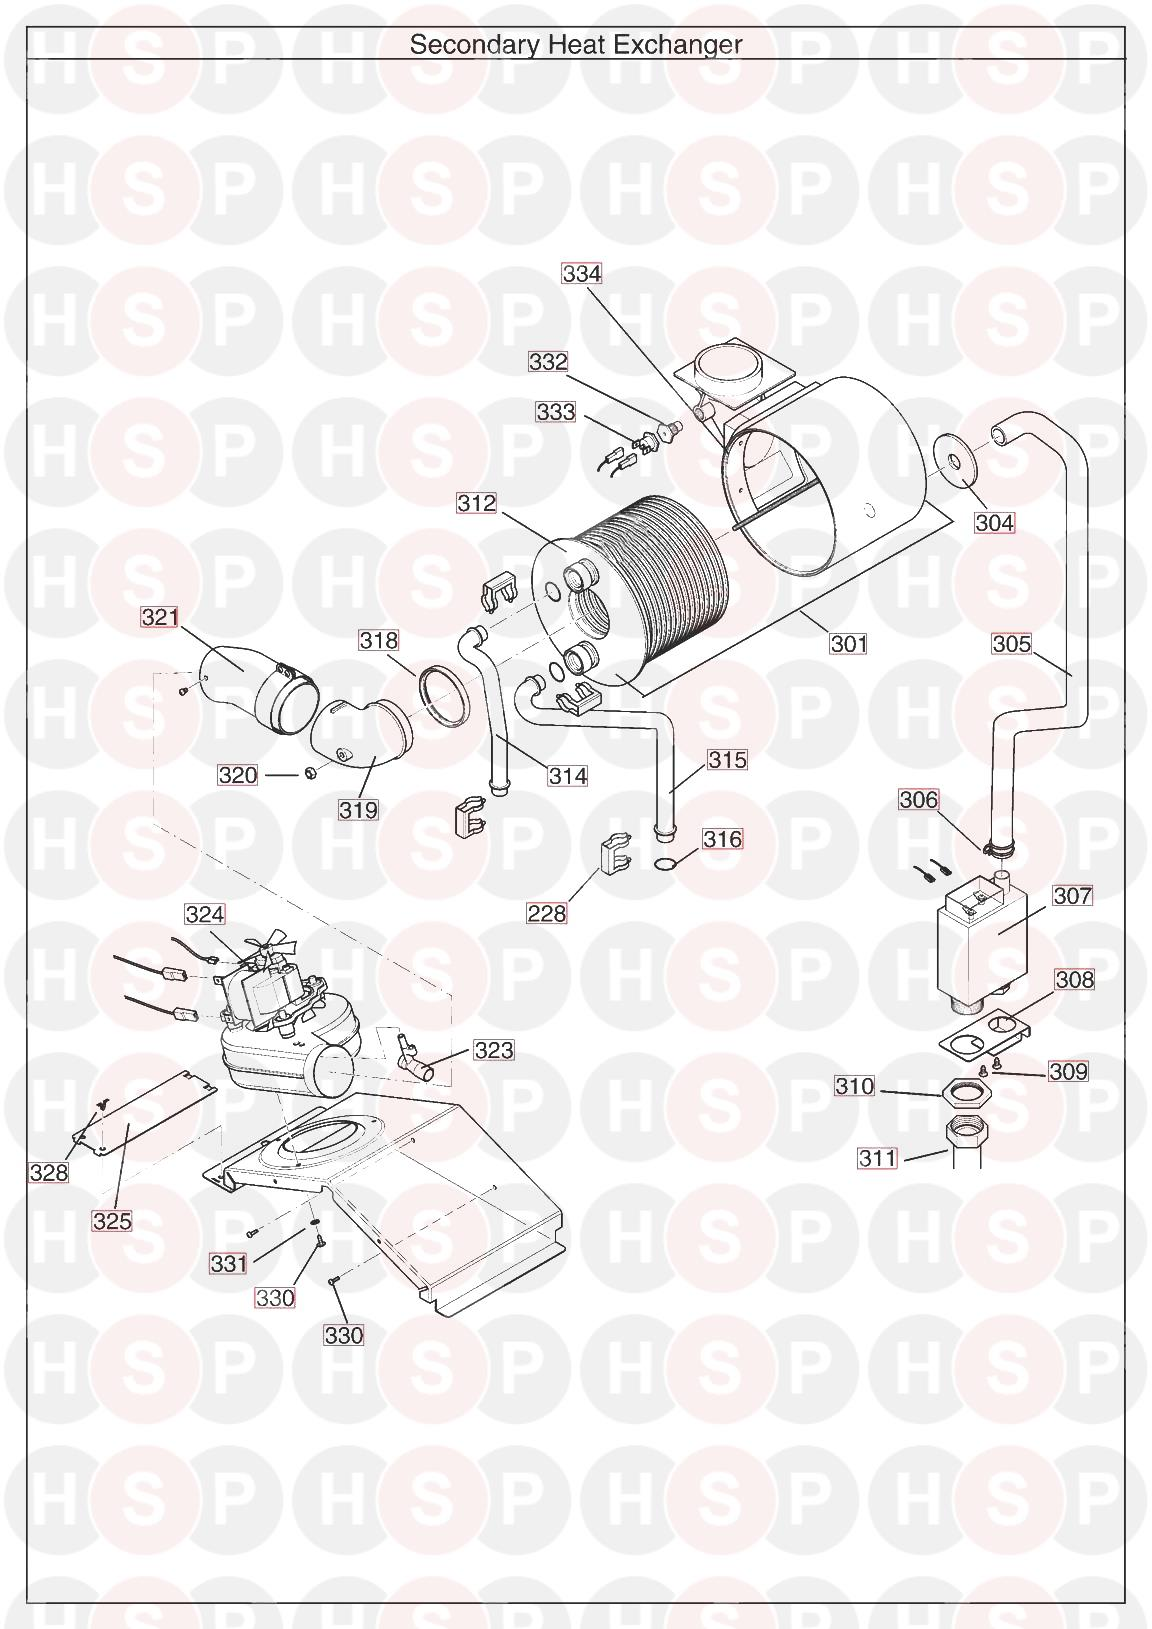 main 24 he system  heat exchanger  diagram